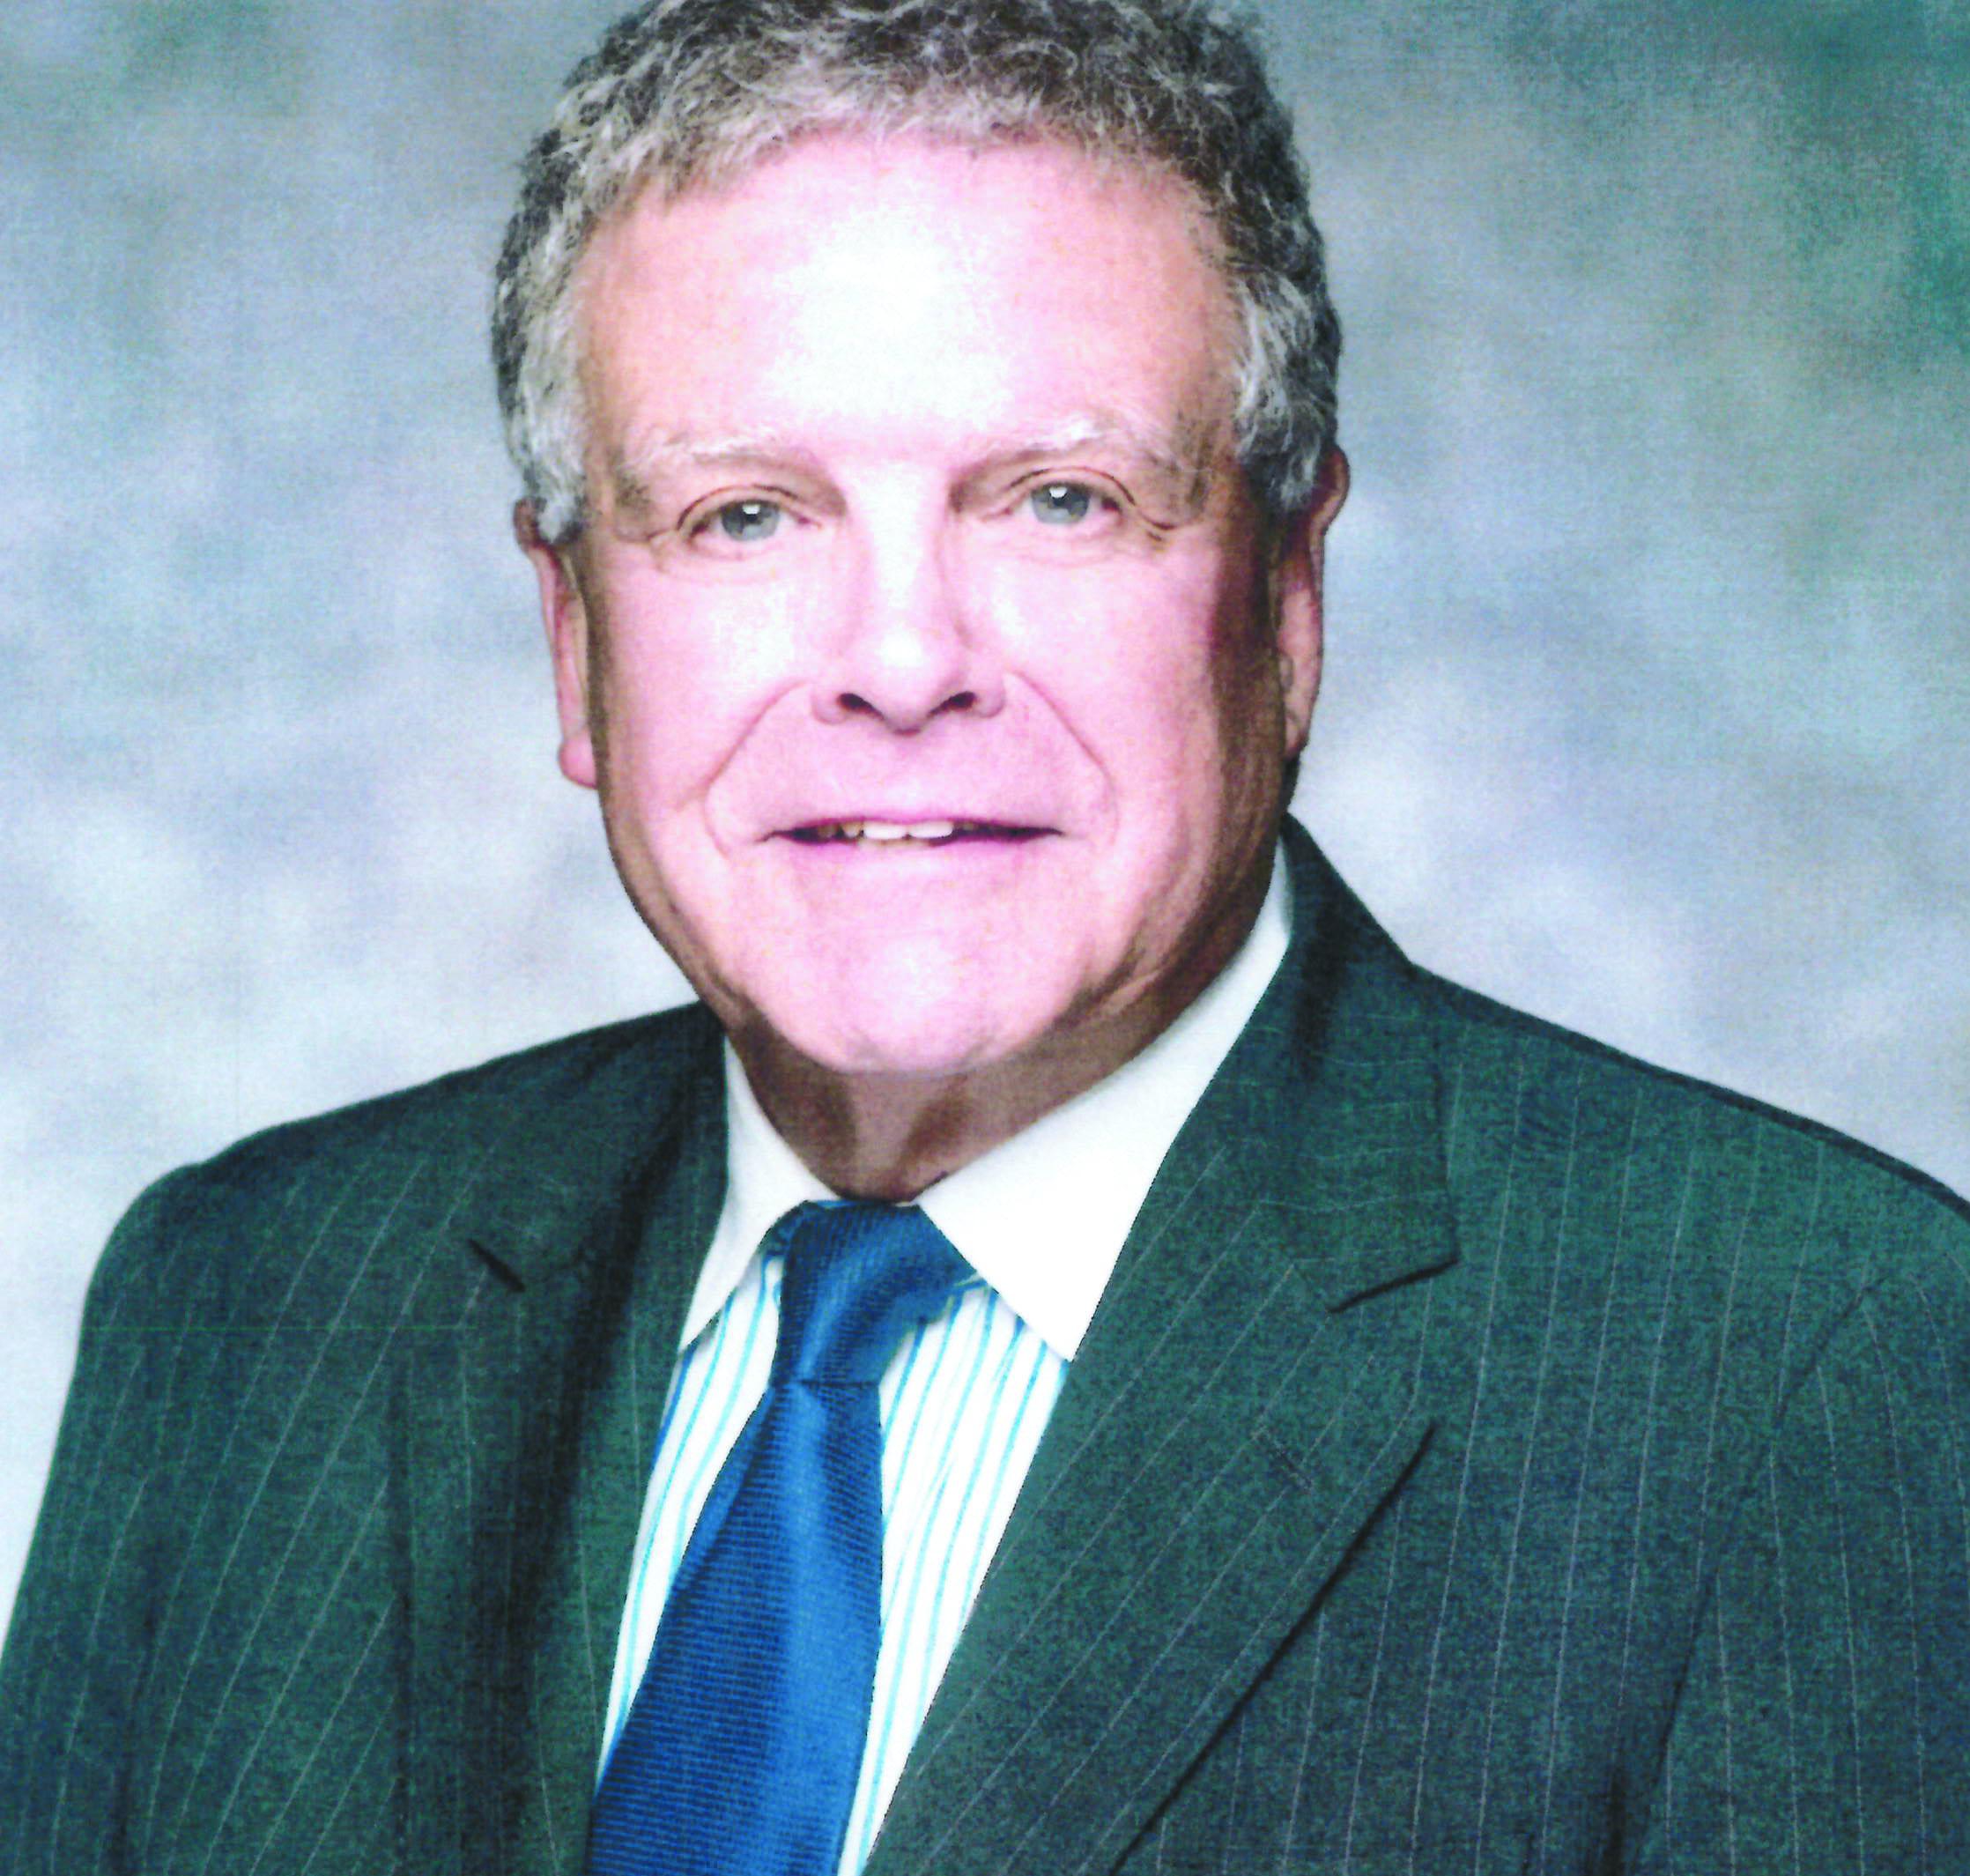 James Kobak